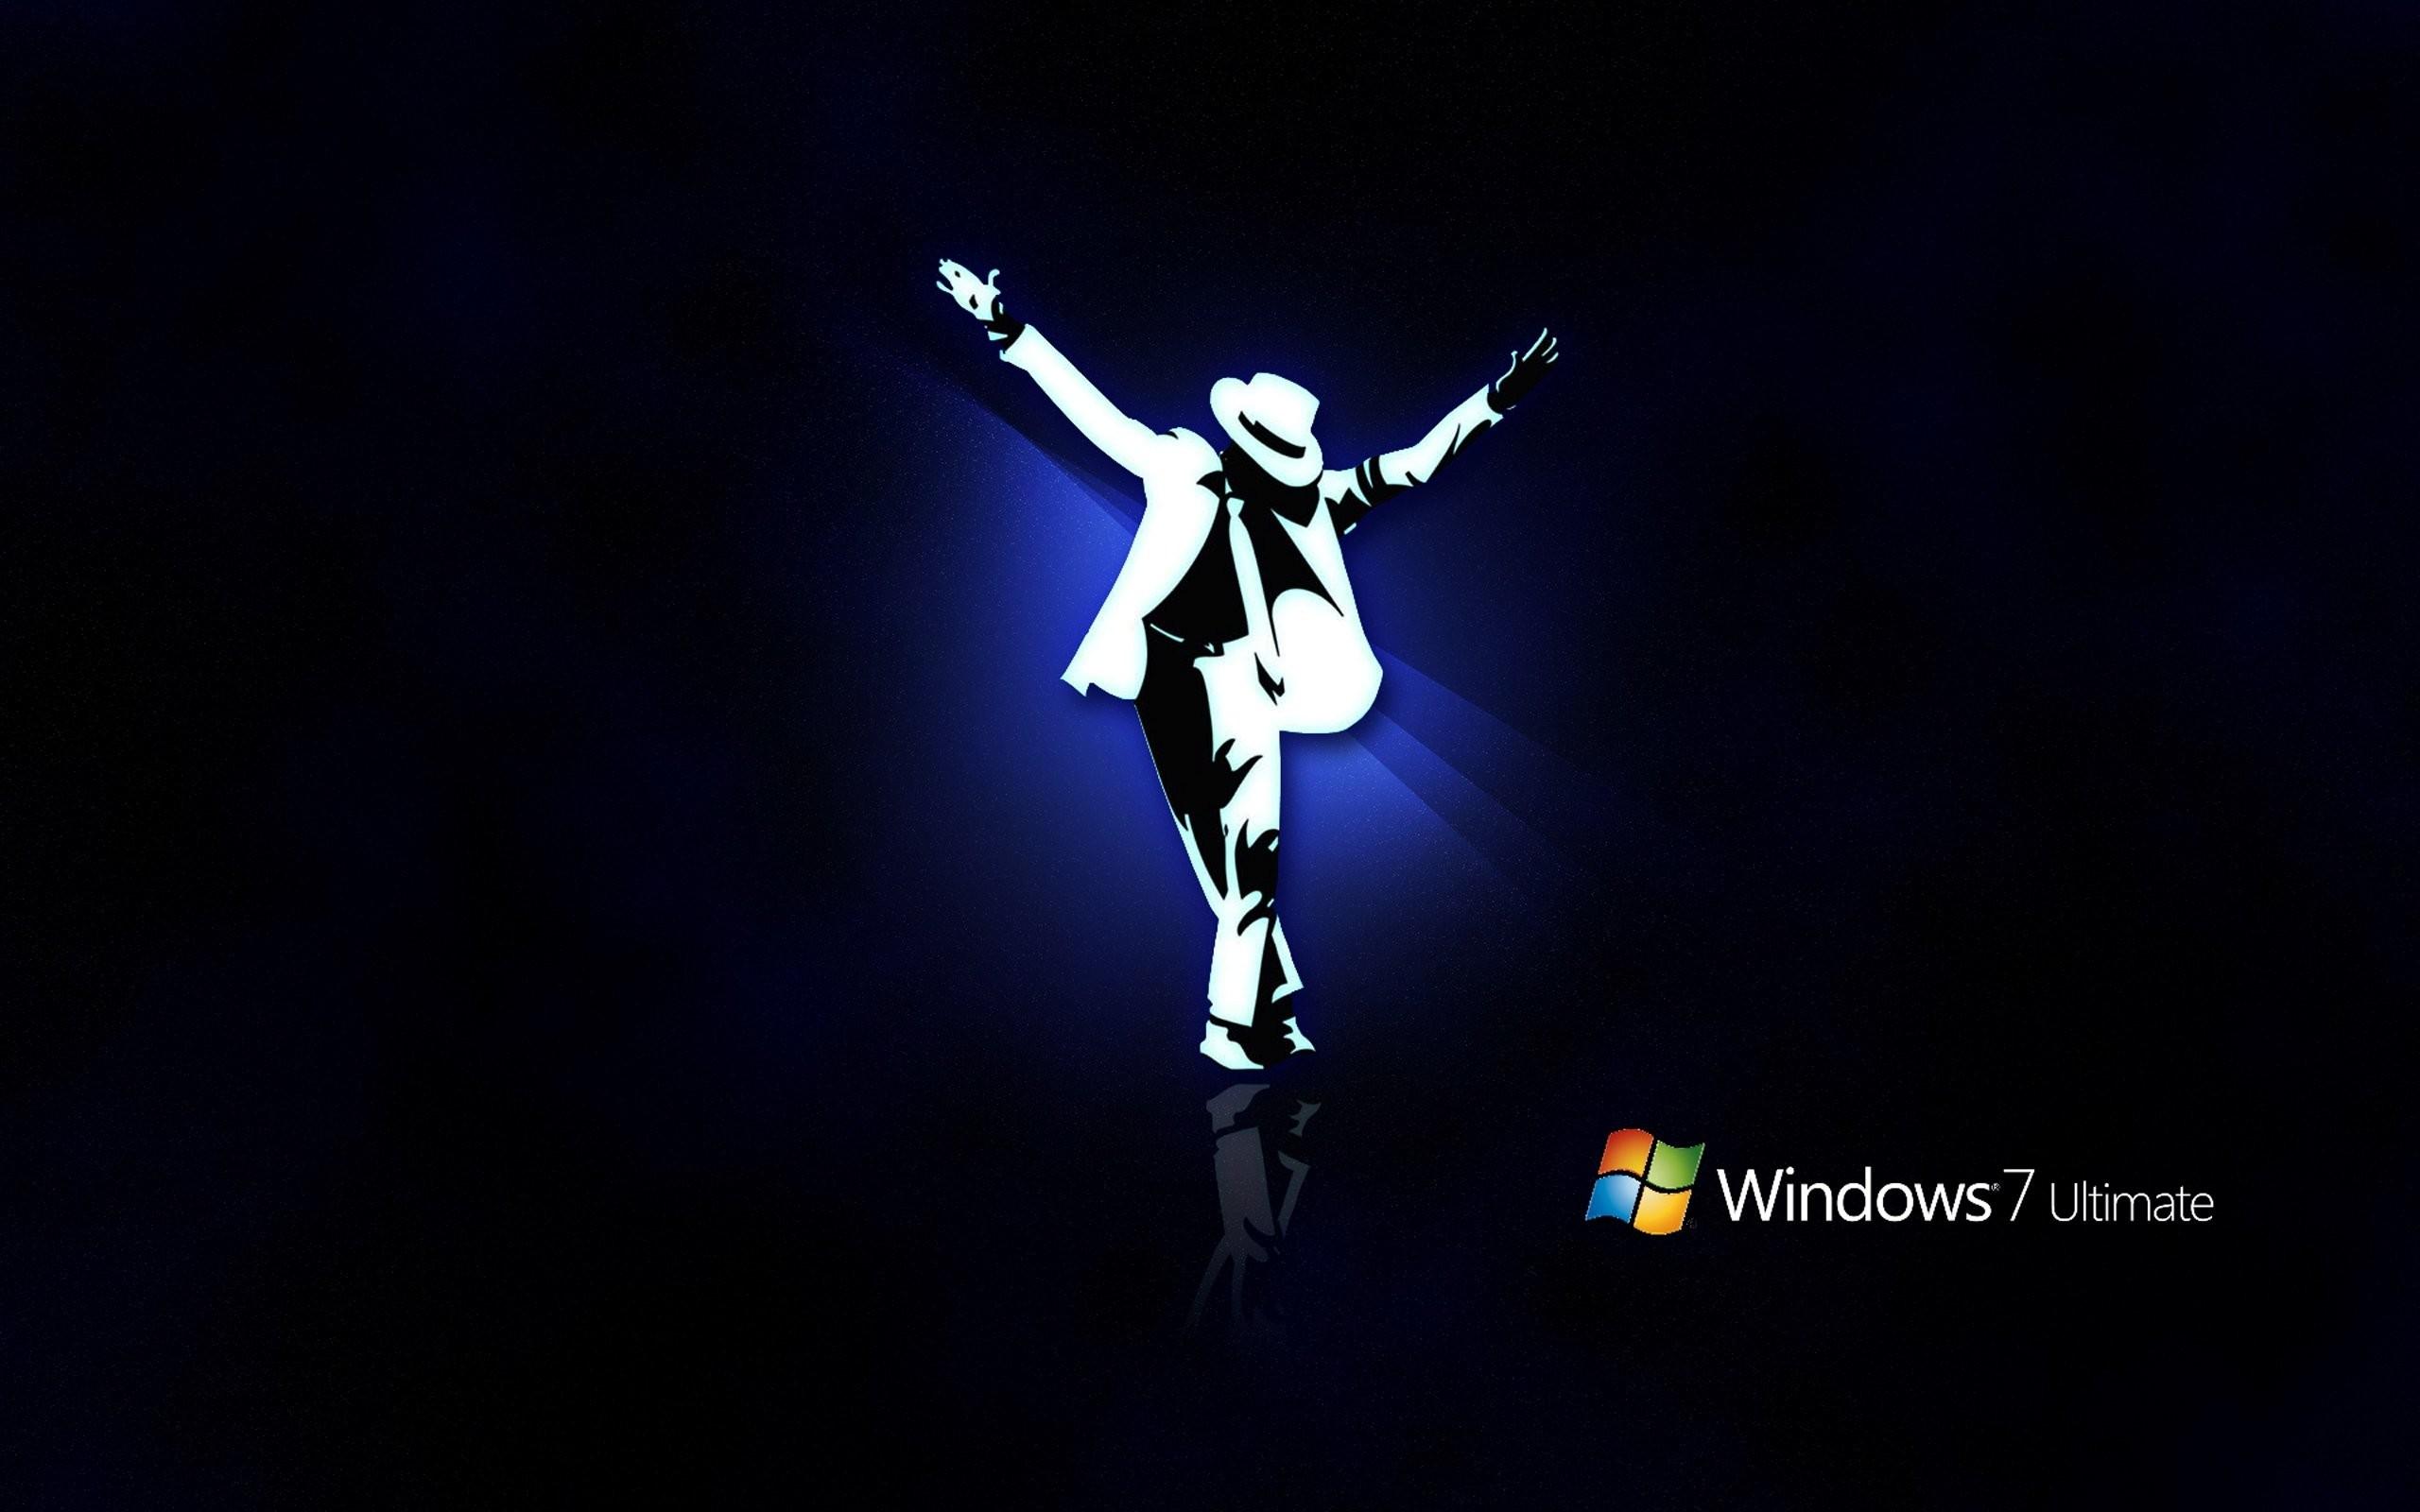 Desktops For Windows 7. SHARE. TAGS: Moving Active Desktop Animated Windows